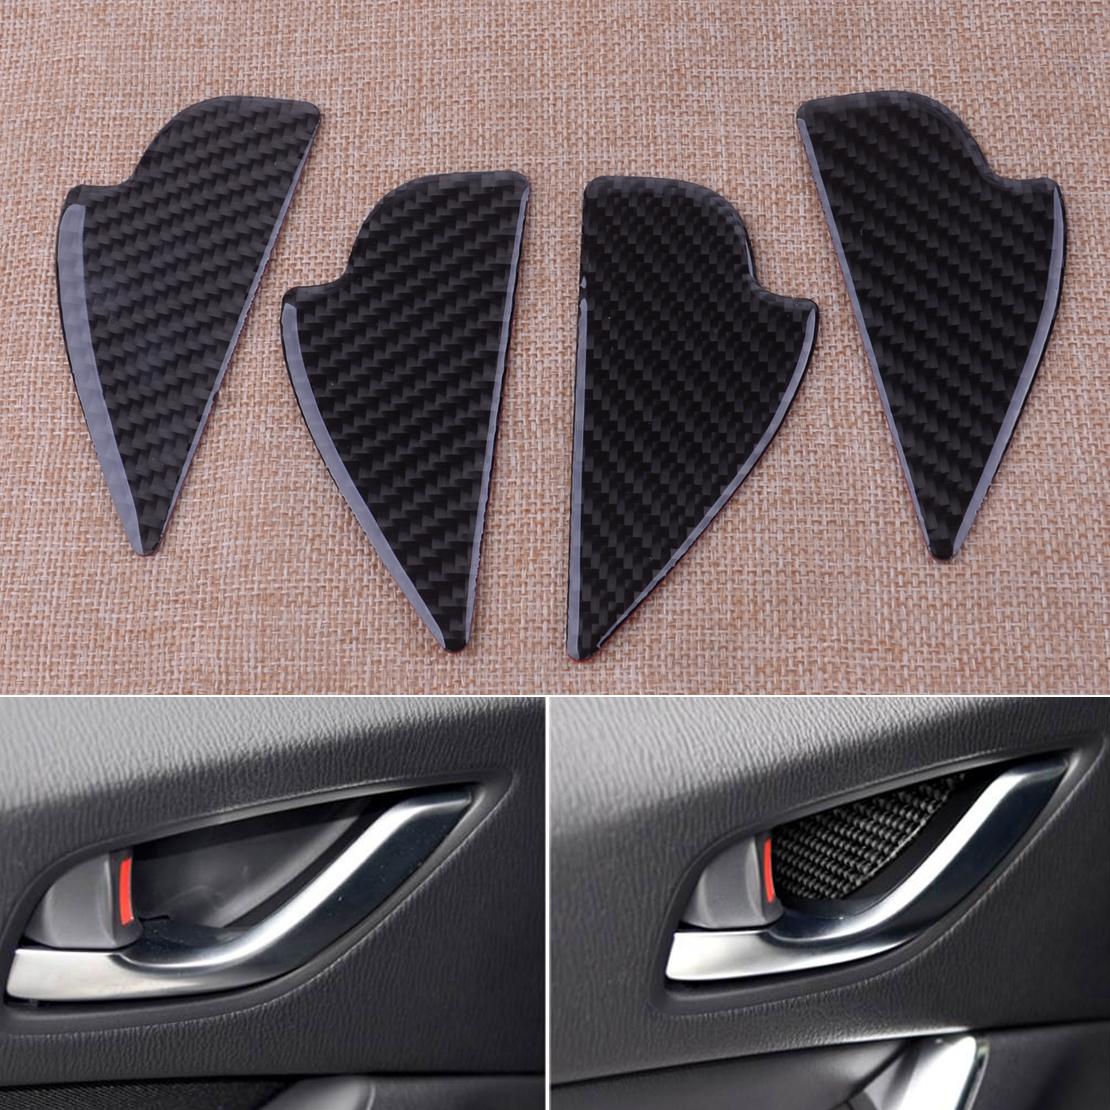 4x For Mazda3 MAZDA 6 CX-5 CX-3 CX-9 Carbon Fiber Inner Door Handle Bowl Cover